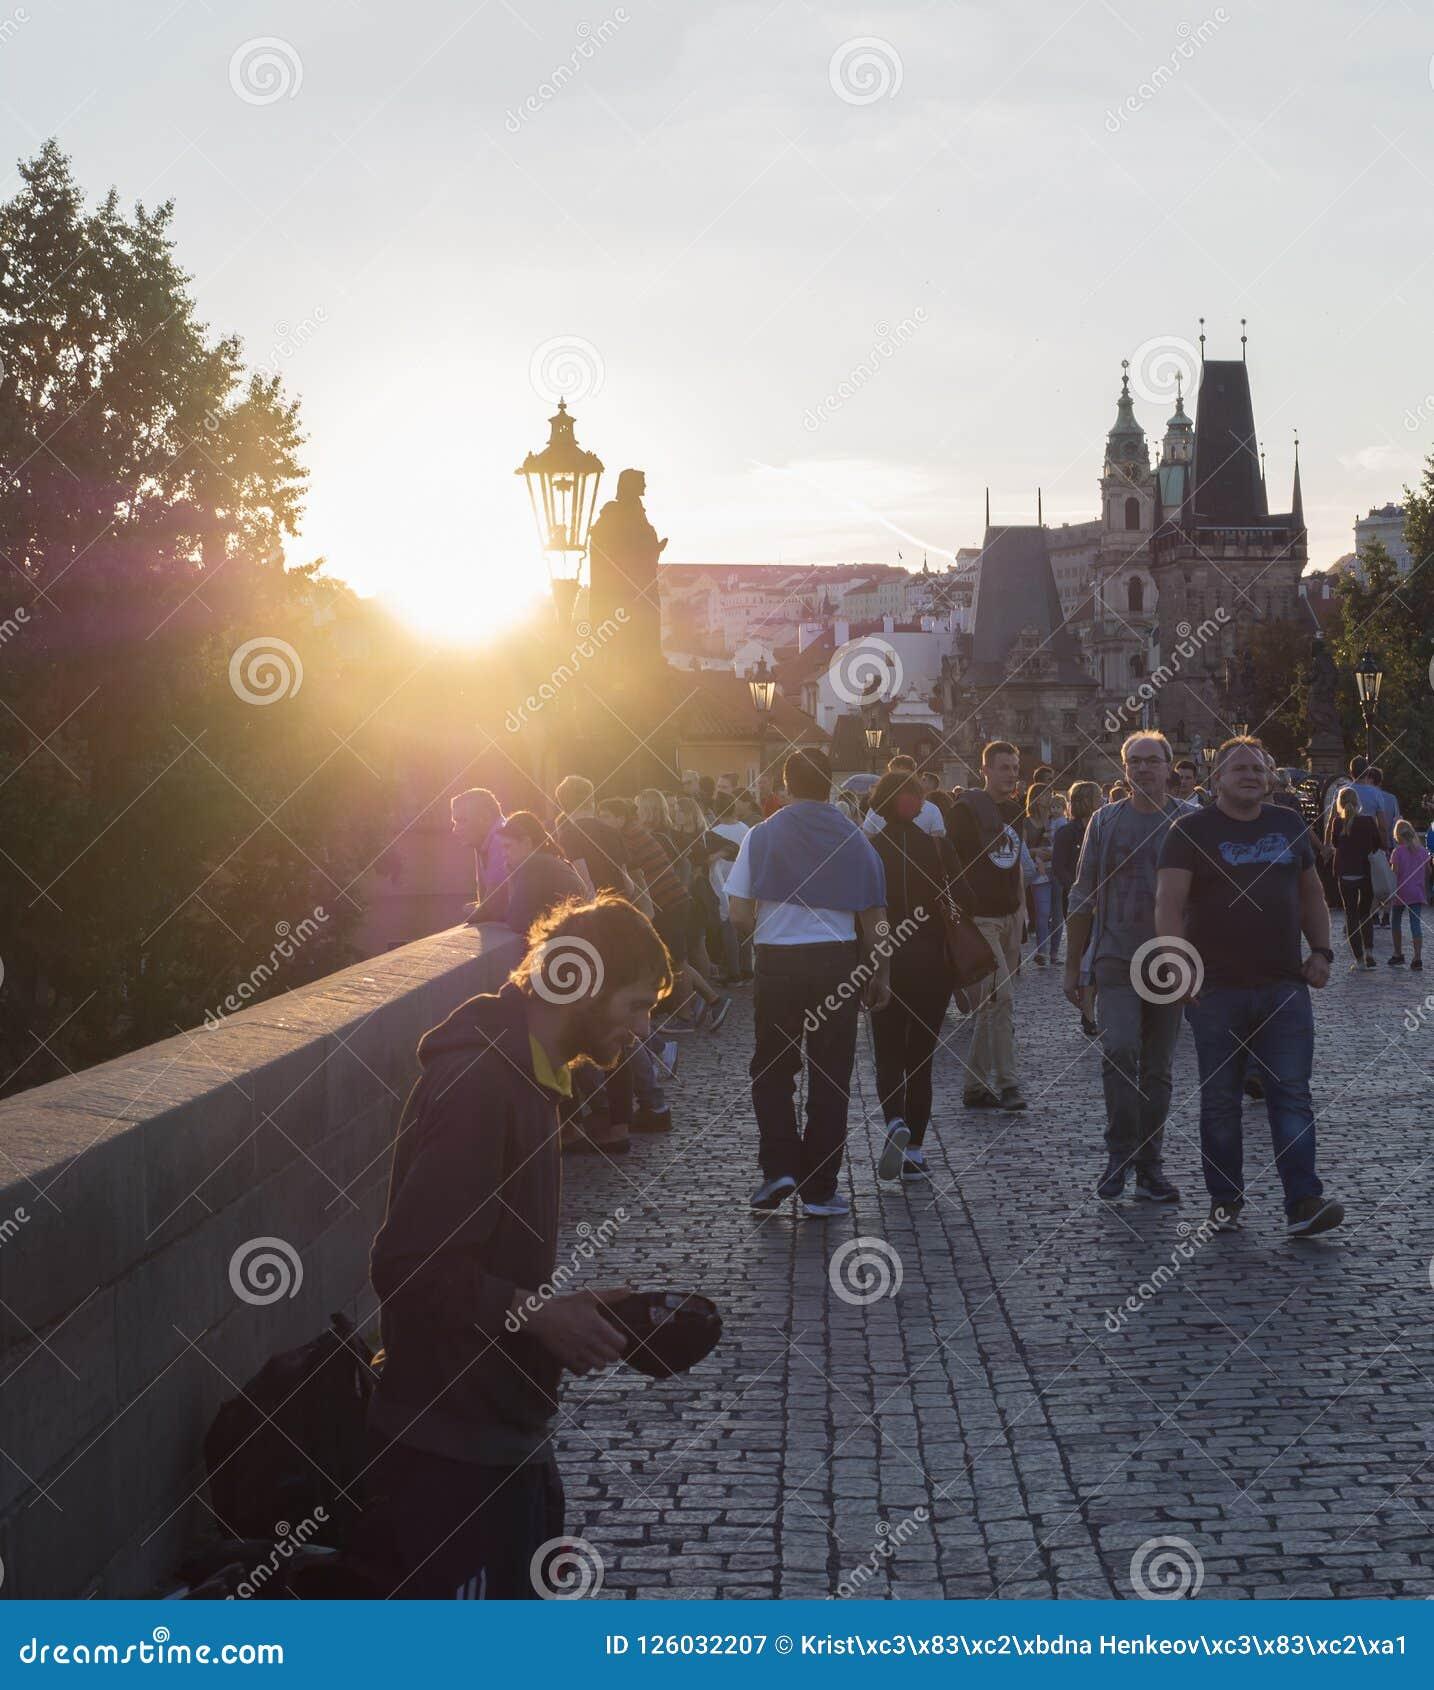 Czech Republic, Prague , September 8, 2018: Young man begging on Charles Bridge on Mala Strana Bridge Tower with walking tourist p